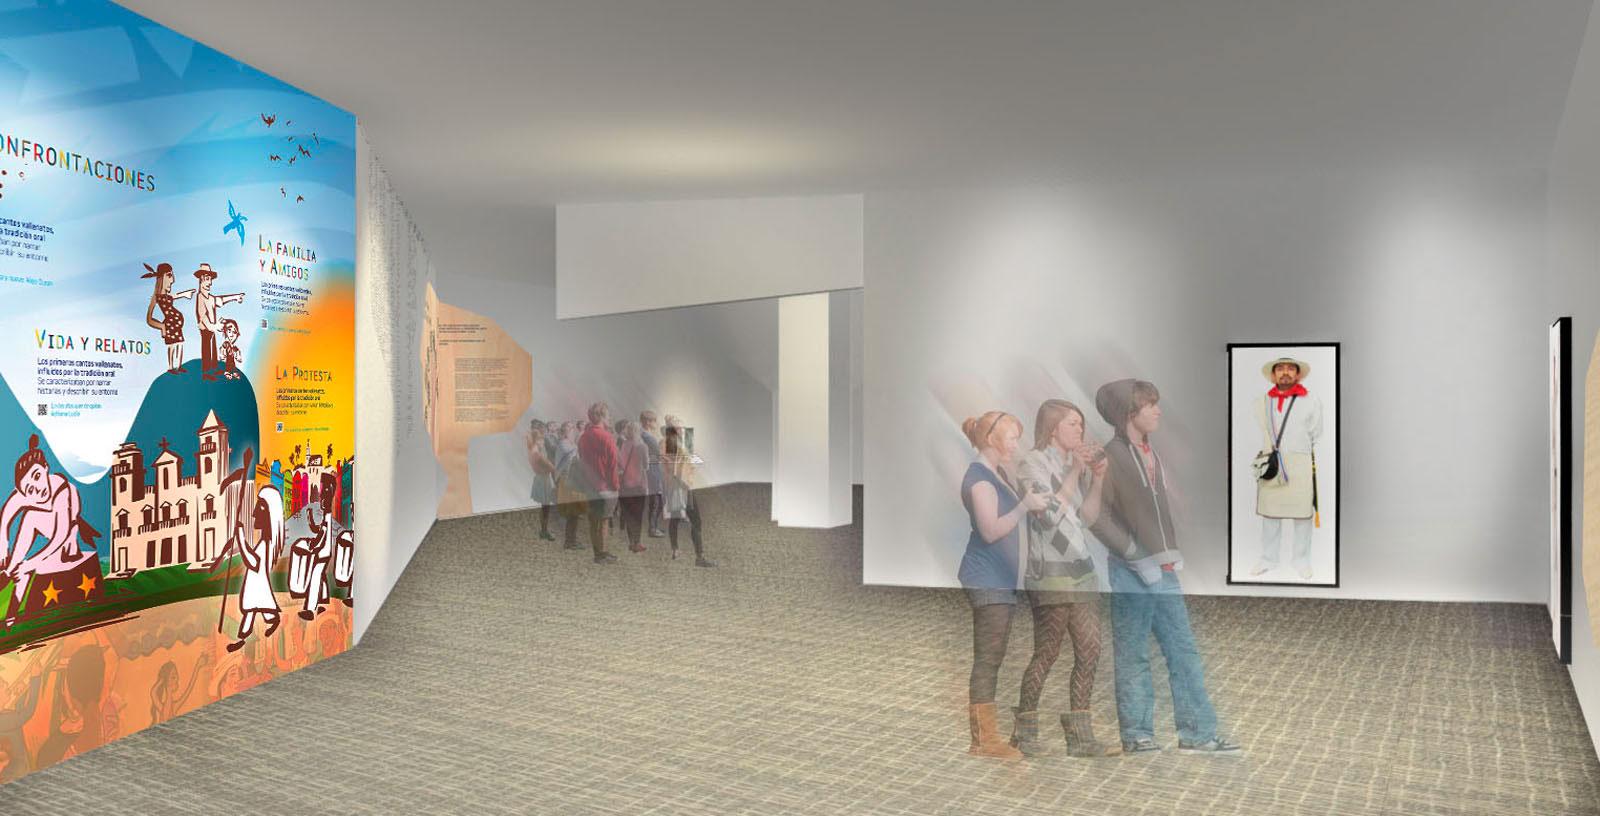 Vallenata-Music-Events-Centre_05_Architecture_Idom_computer-graphics_Manuel-Leira